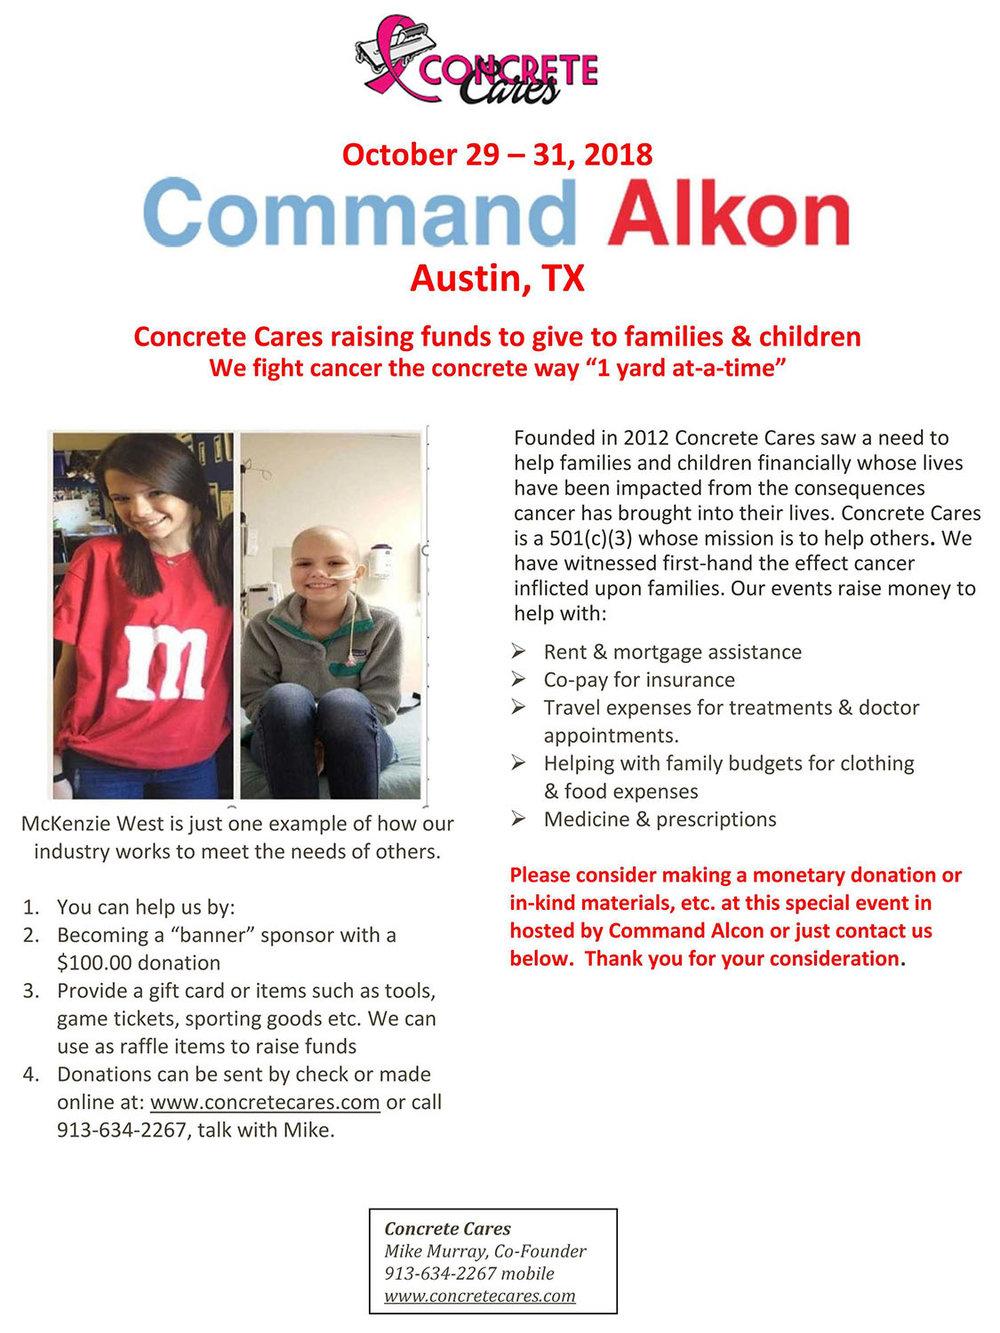 Concrete Cares 2018 Command Alkon.jpg